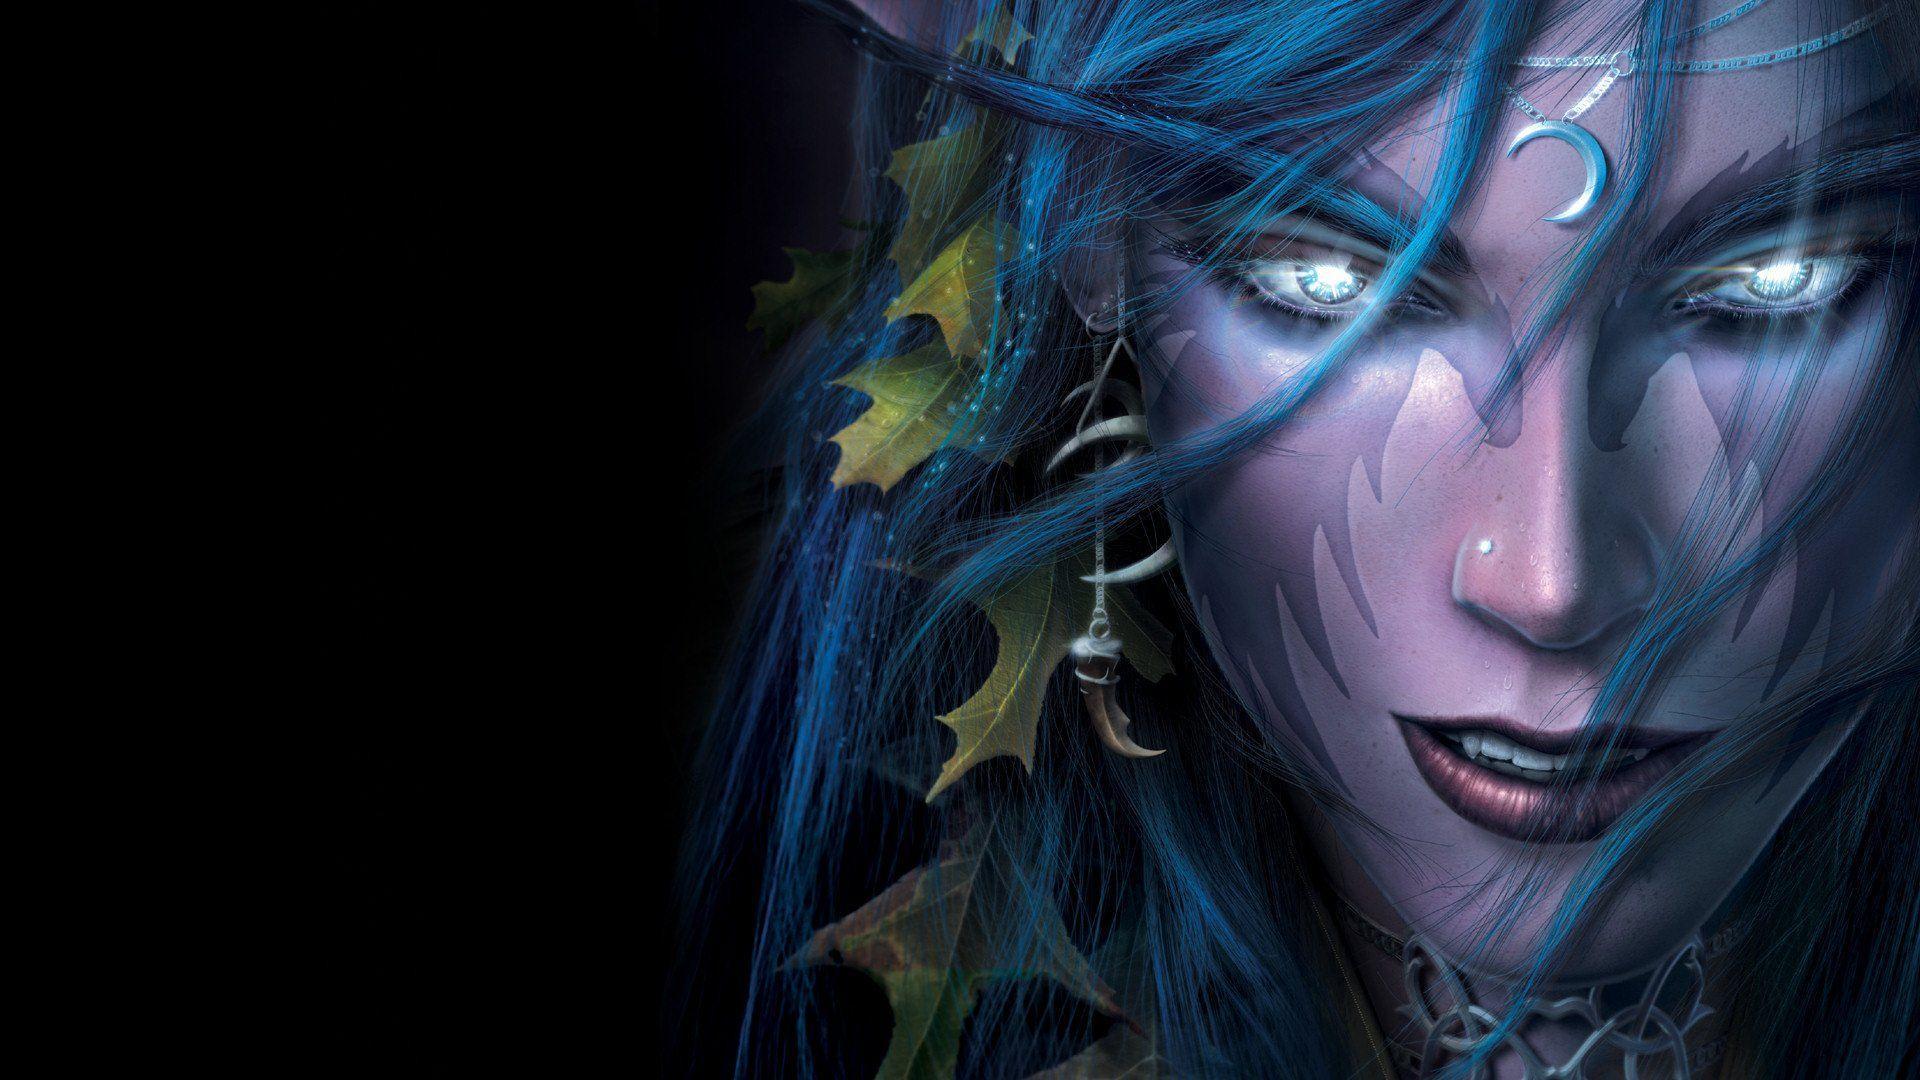 Warcraft Elf Wallpapers Top Free Warcraft Elf Backgrounds